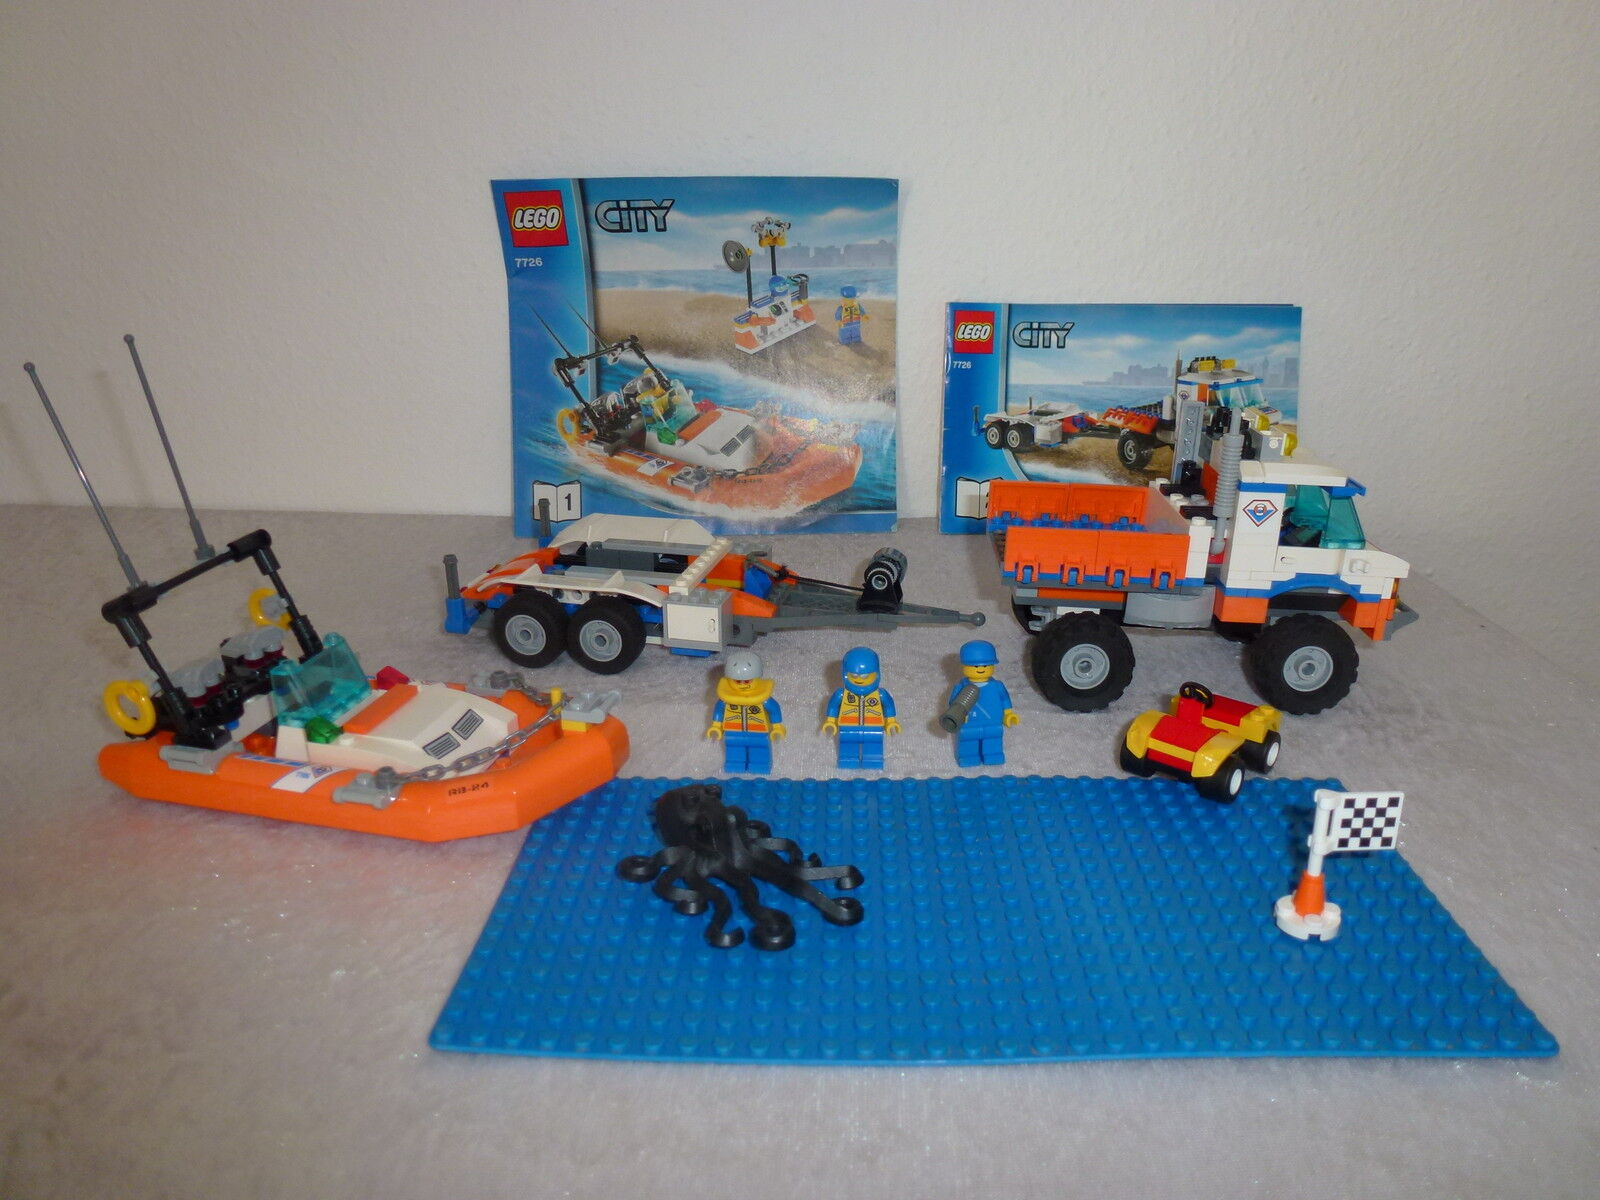 Lego City  7726 Blatt 1 + 2 + OBA + Autos uvm.  Rarität   (46)